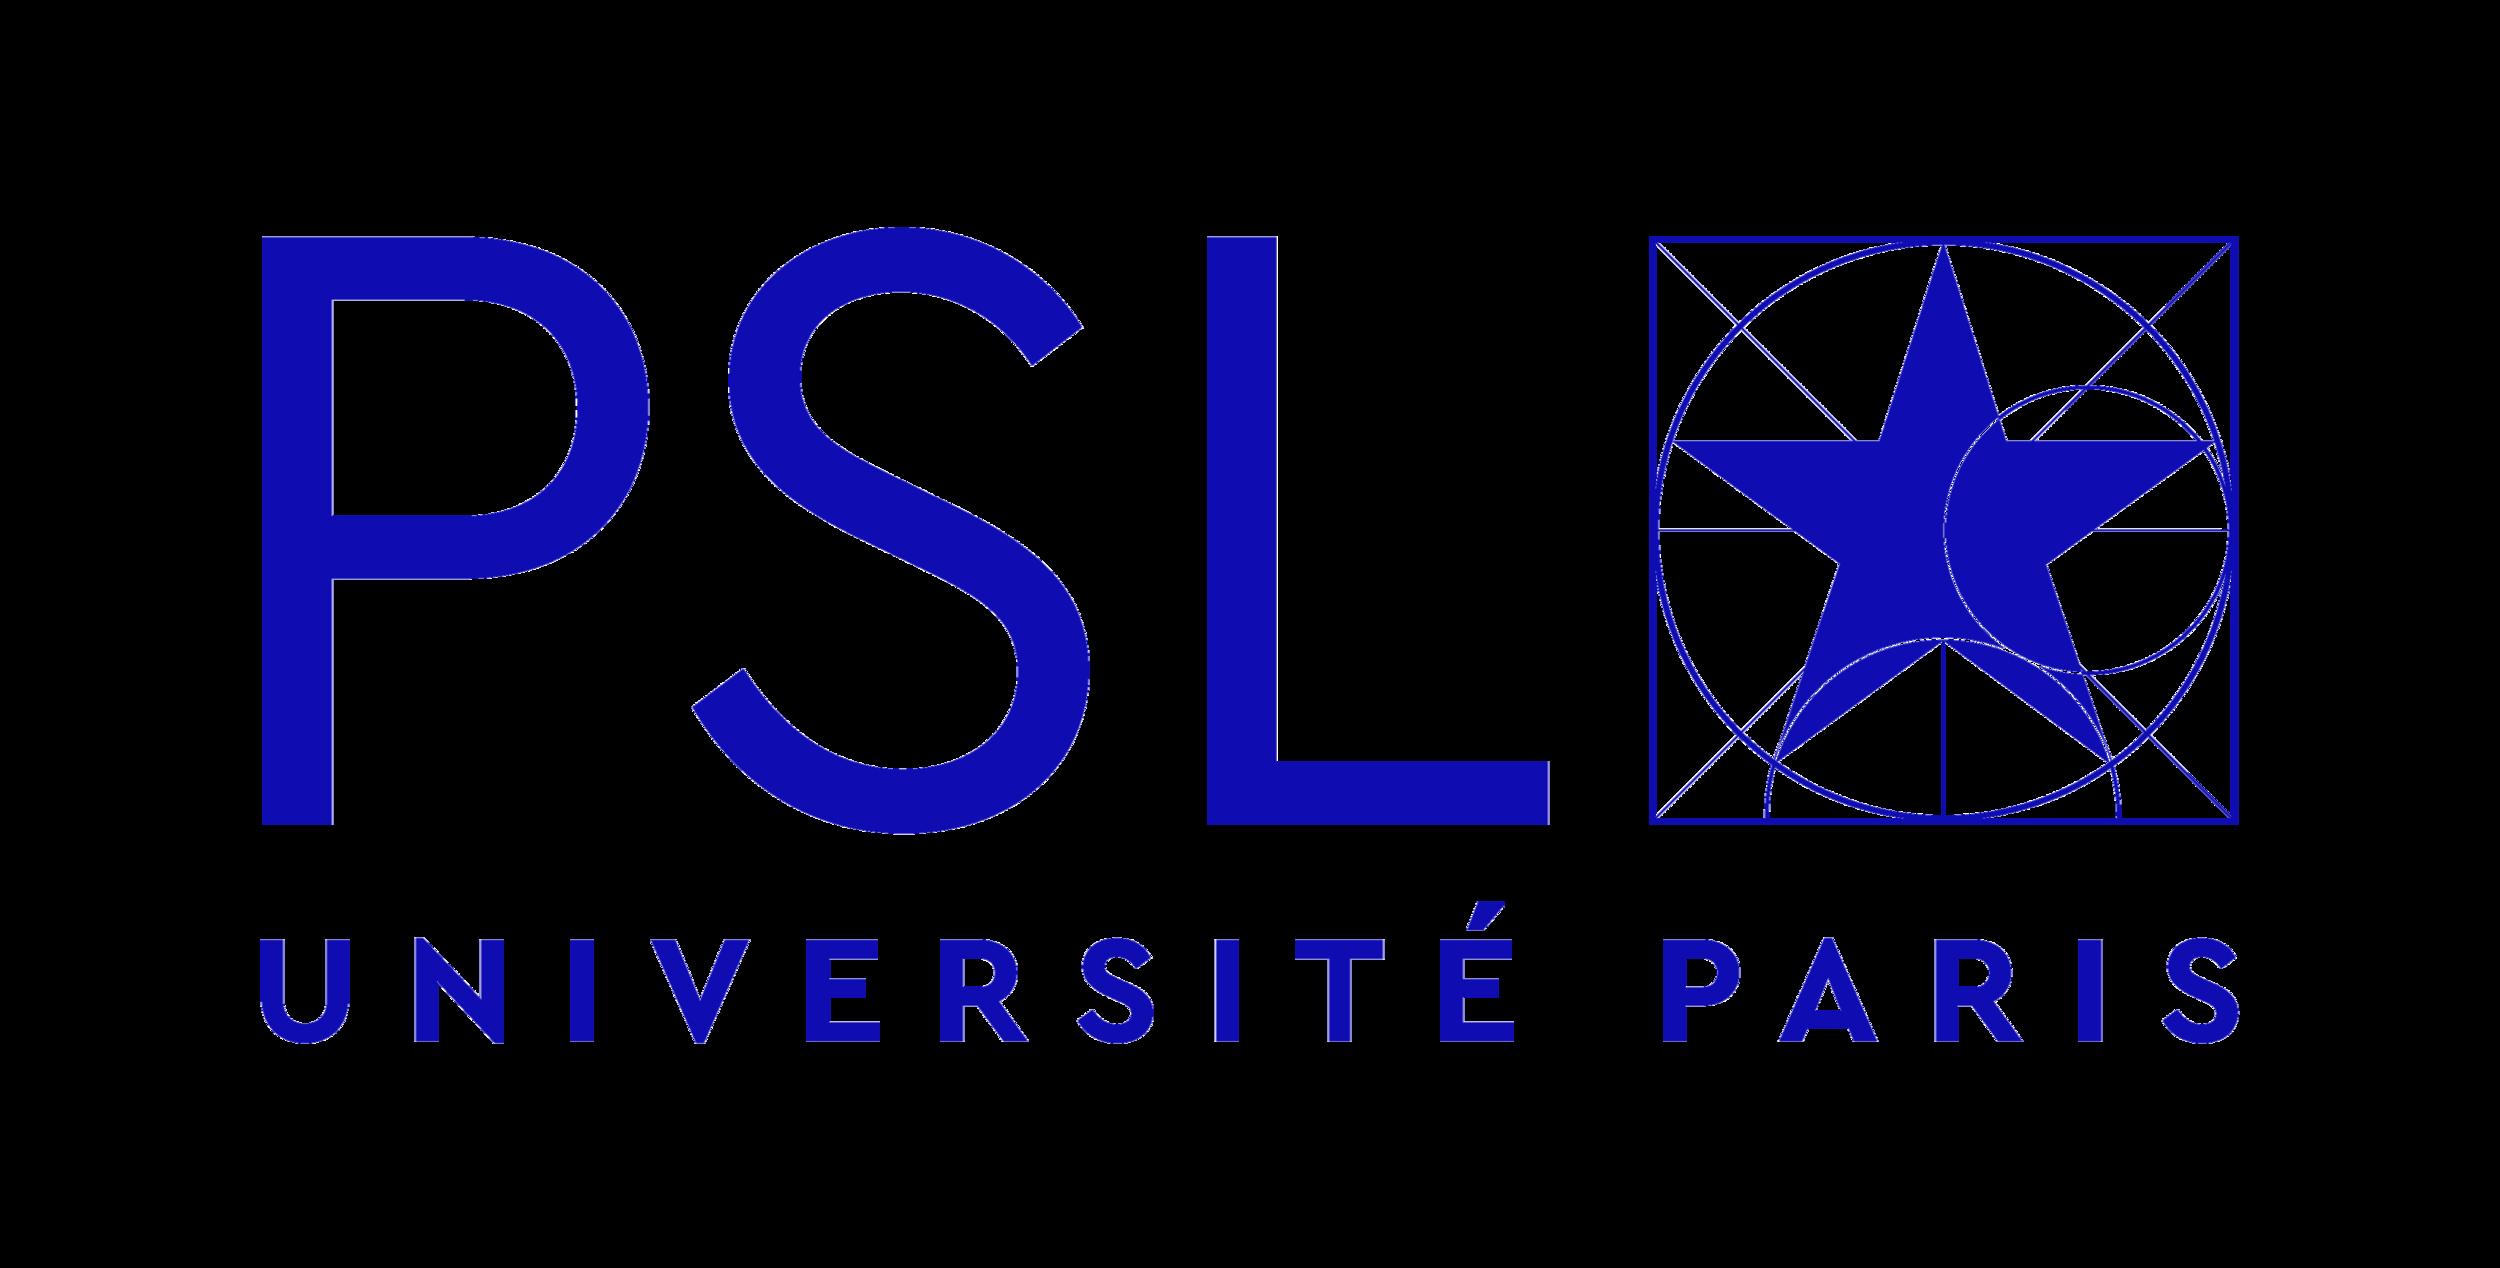 LOGO-PSL-nov-2017-BLEU-RVB.png